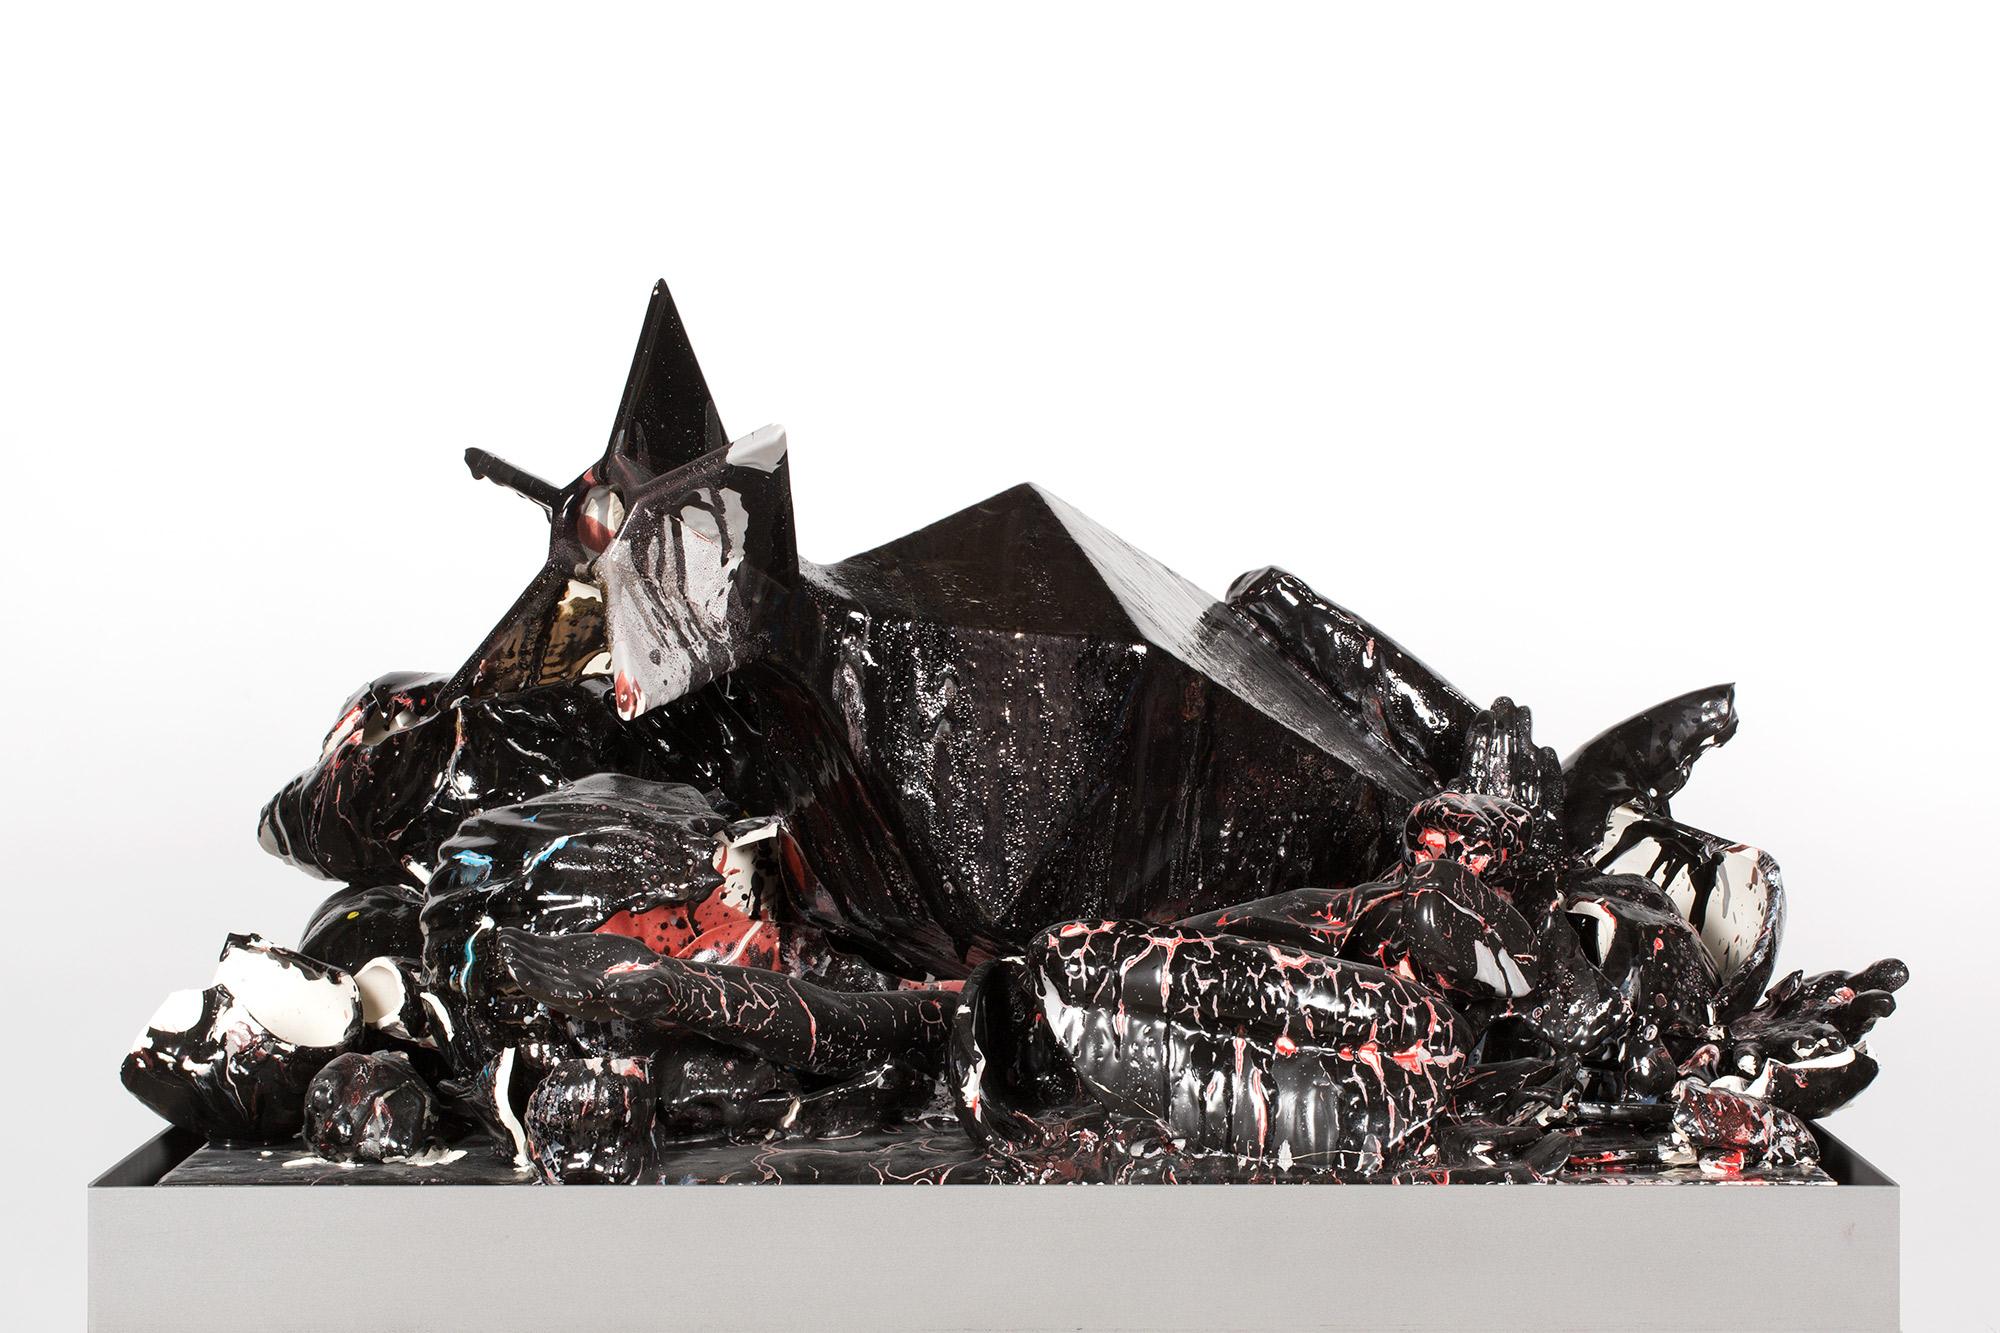 La Religiosidad Americana (February 17–March 1, 2015: Cerámica Suro Contemporánea, Guadalajara, Jalisco, Mexico)    2015   Ceramica Suro slip cast remnants, glaze, and firing plate  55 1/2 x 42 x 26 1/2 inches   All the World's Futures, 2015